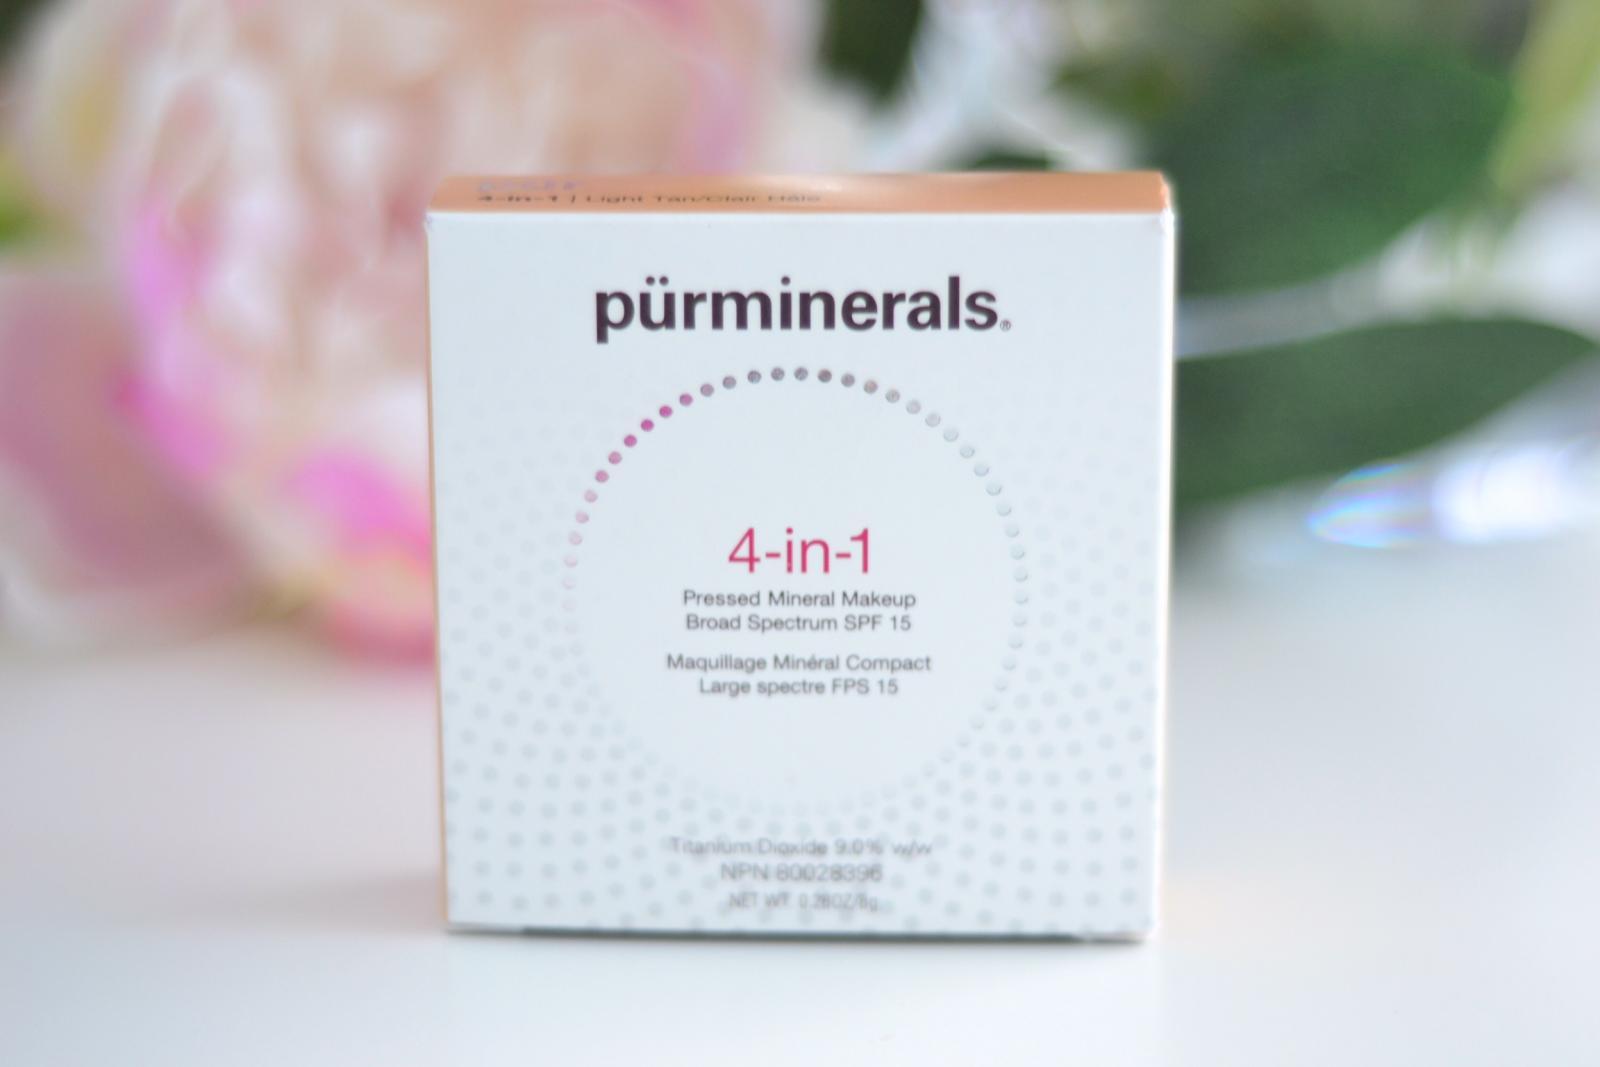 pur-minerals-pressed-powder-packaging